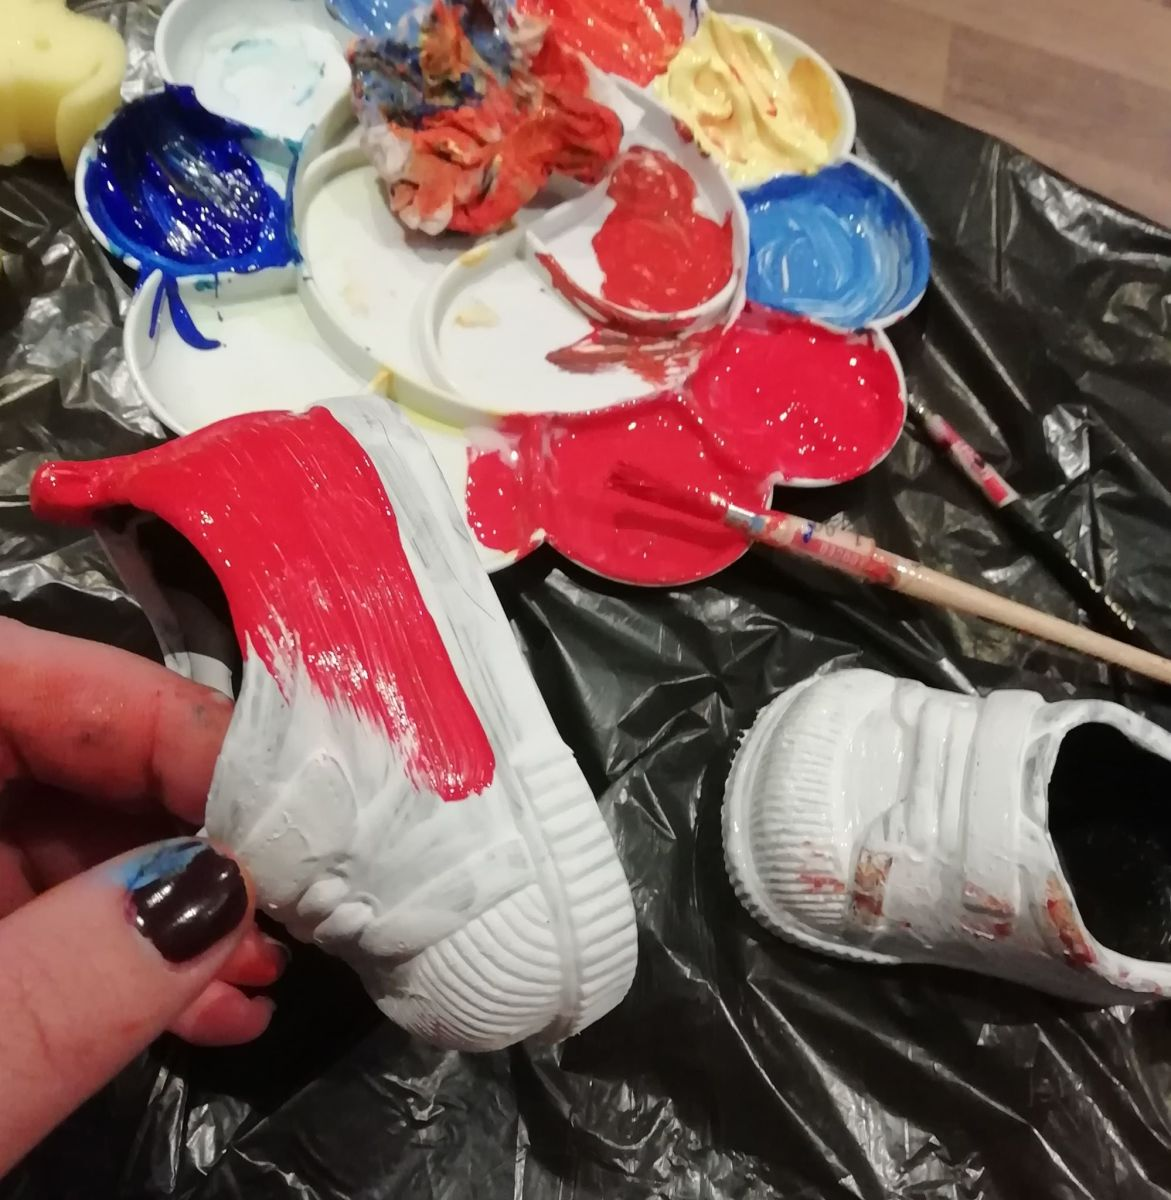 Paint the shoes